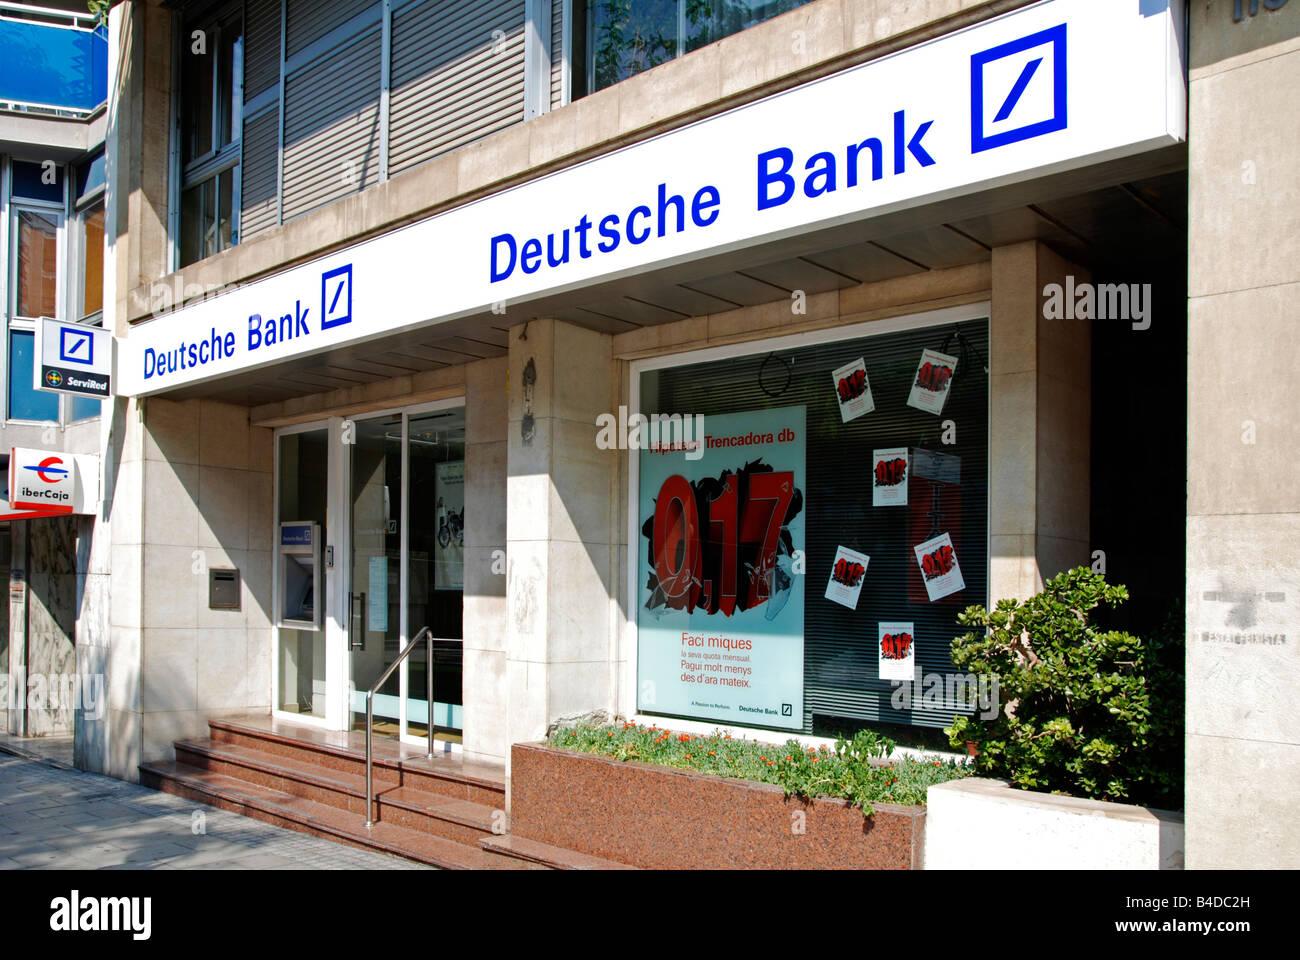 Deutsche Bank Eingang, Tarragona, Spanien Stockbild